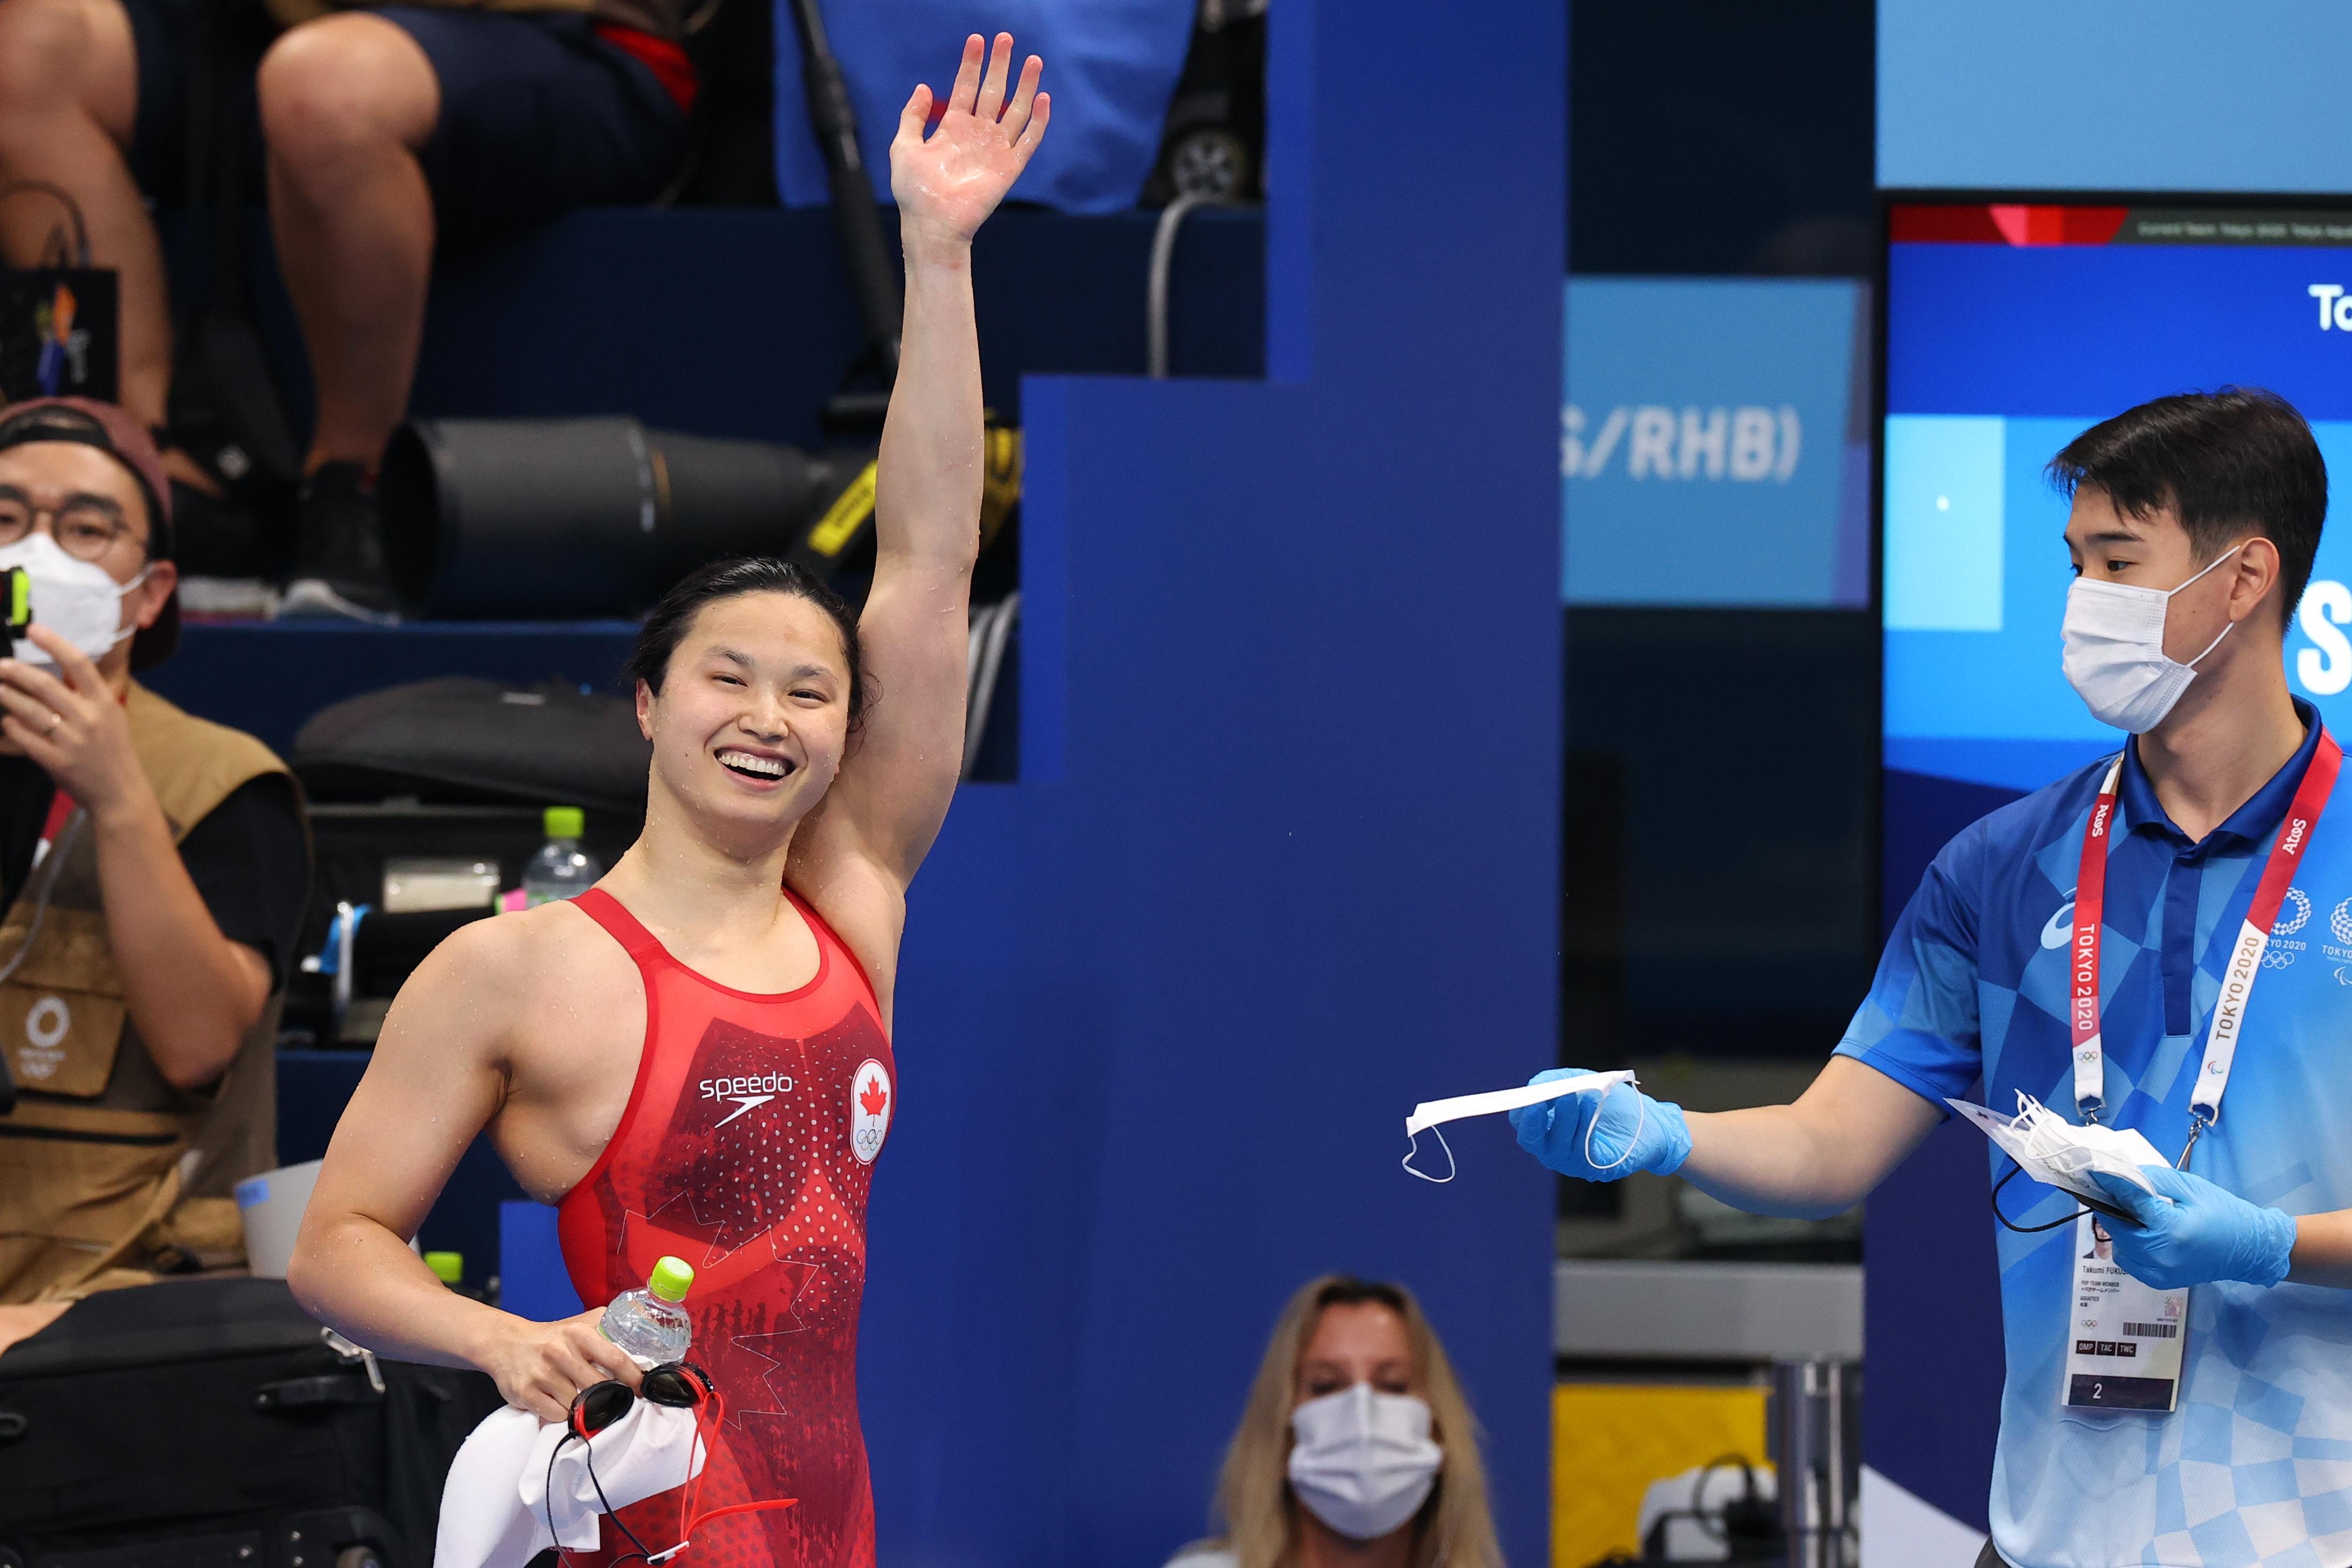 Tokyo 2020 Olympics - Swimming - Women's 100m Butterfly - Final - Tokyo Aquatics Centre - Tokyo, Japan - July 26, 2021. Margaret MacNeil of Canada celebrates after winning the gold medal REUTERS/Marko Djurica